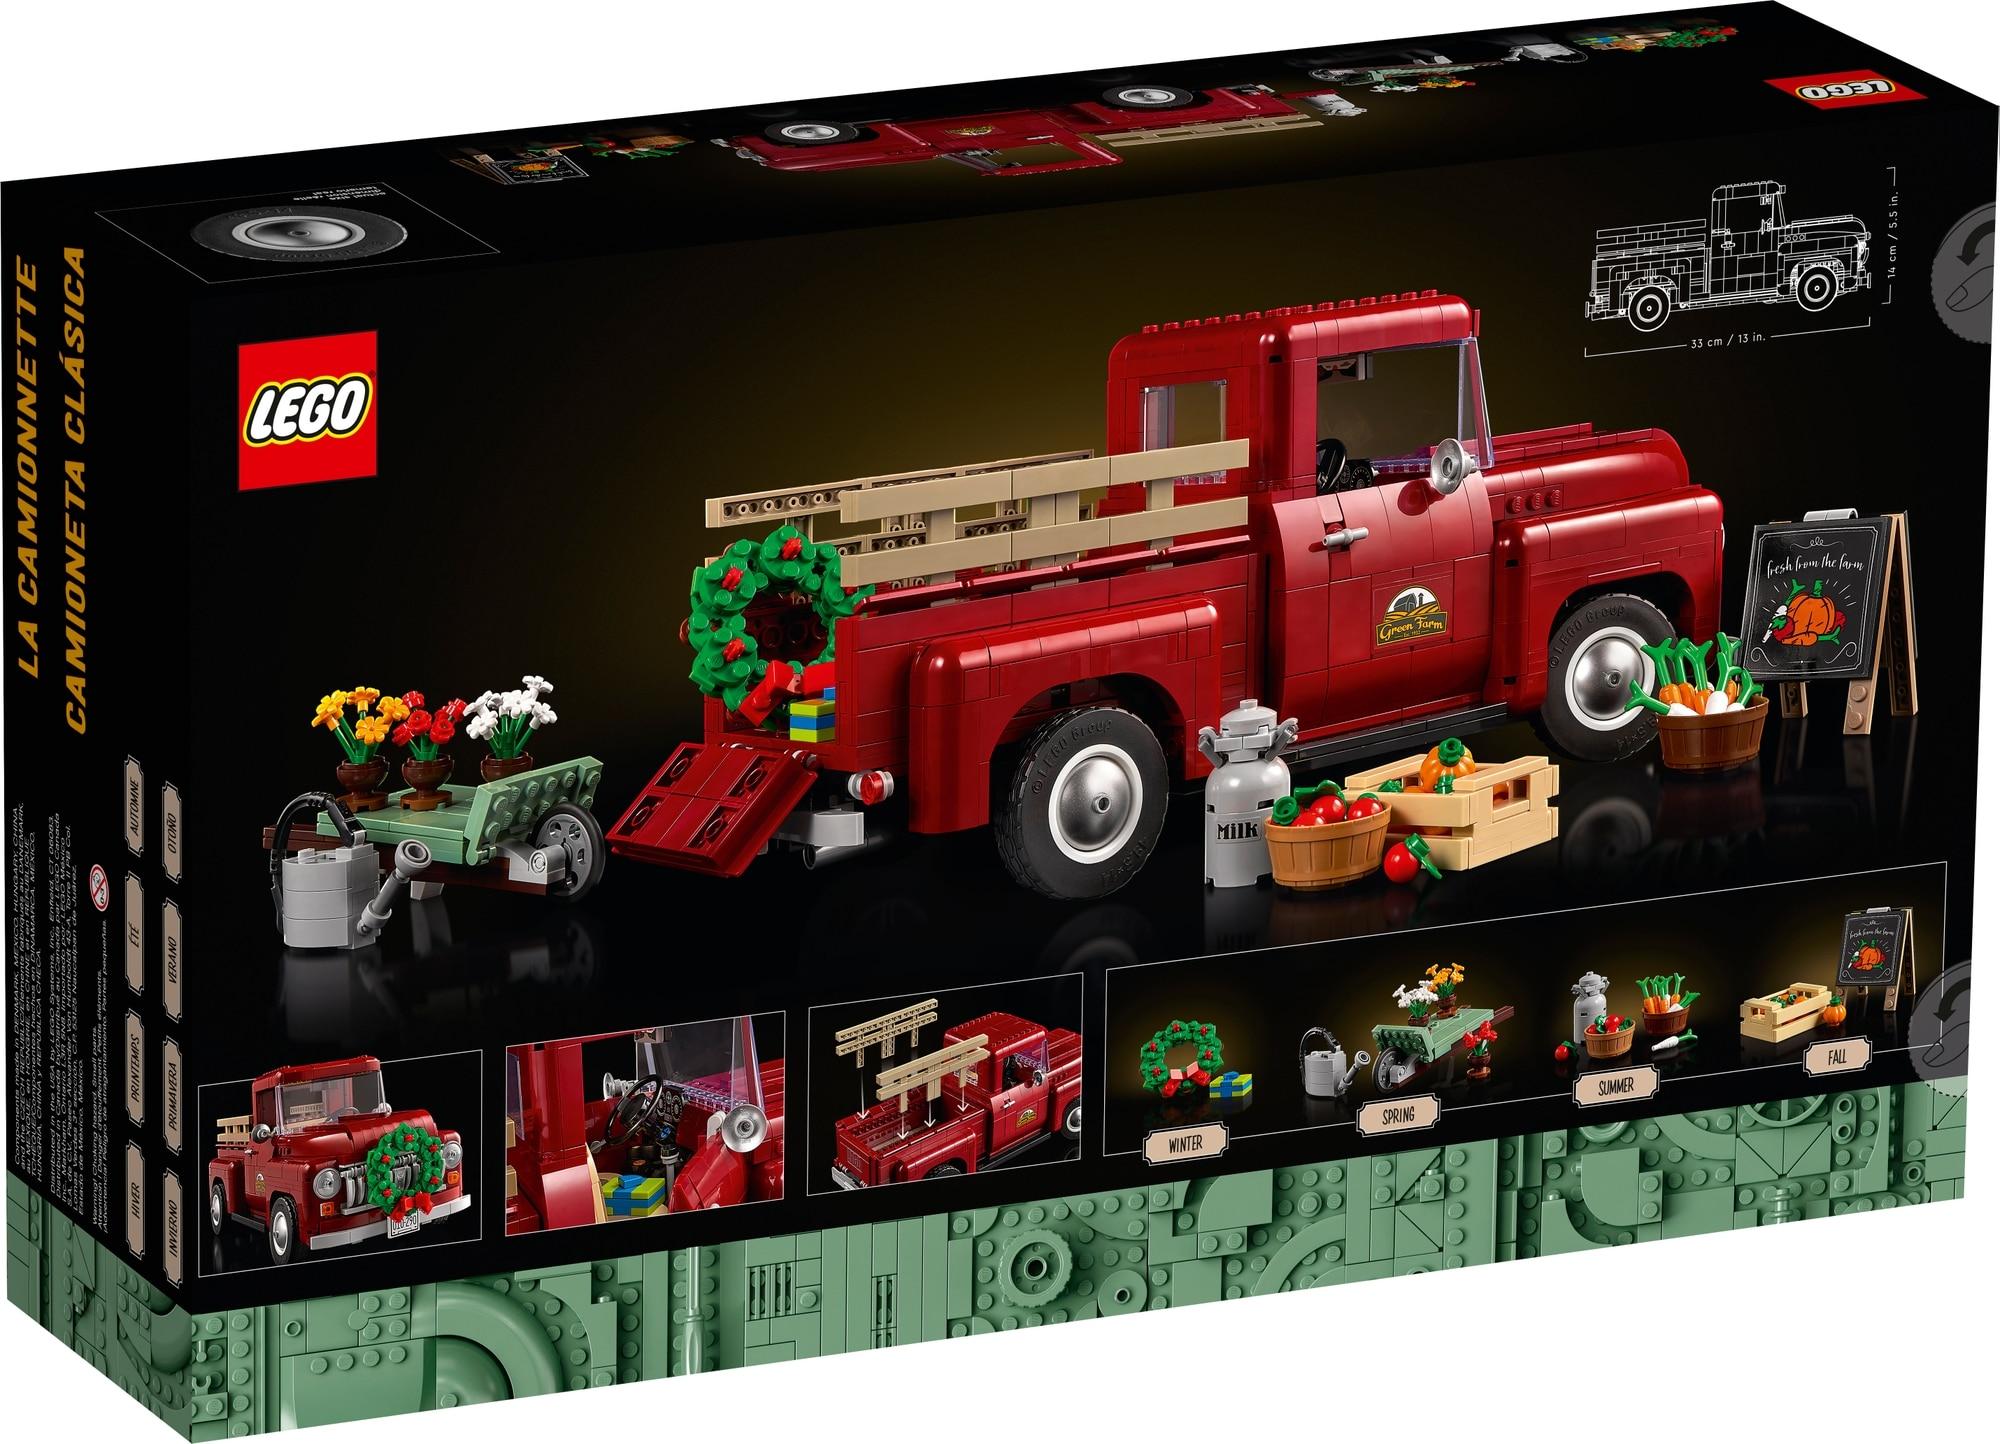 LEGO Creator Expert 10290 Pickup 13